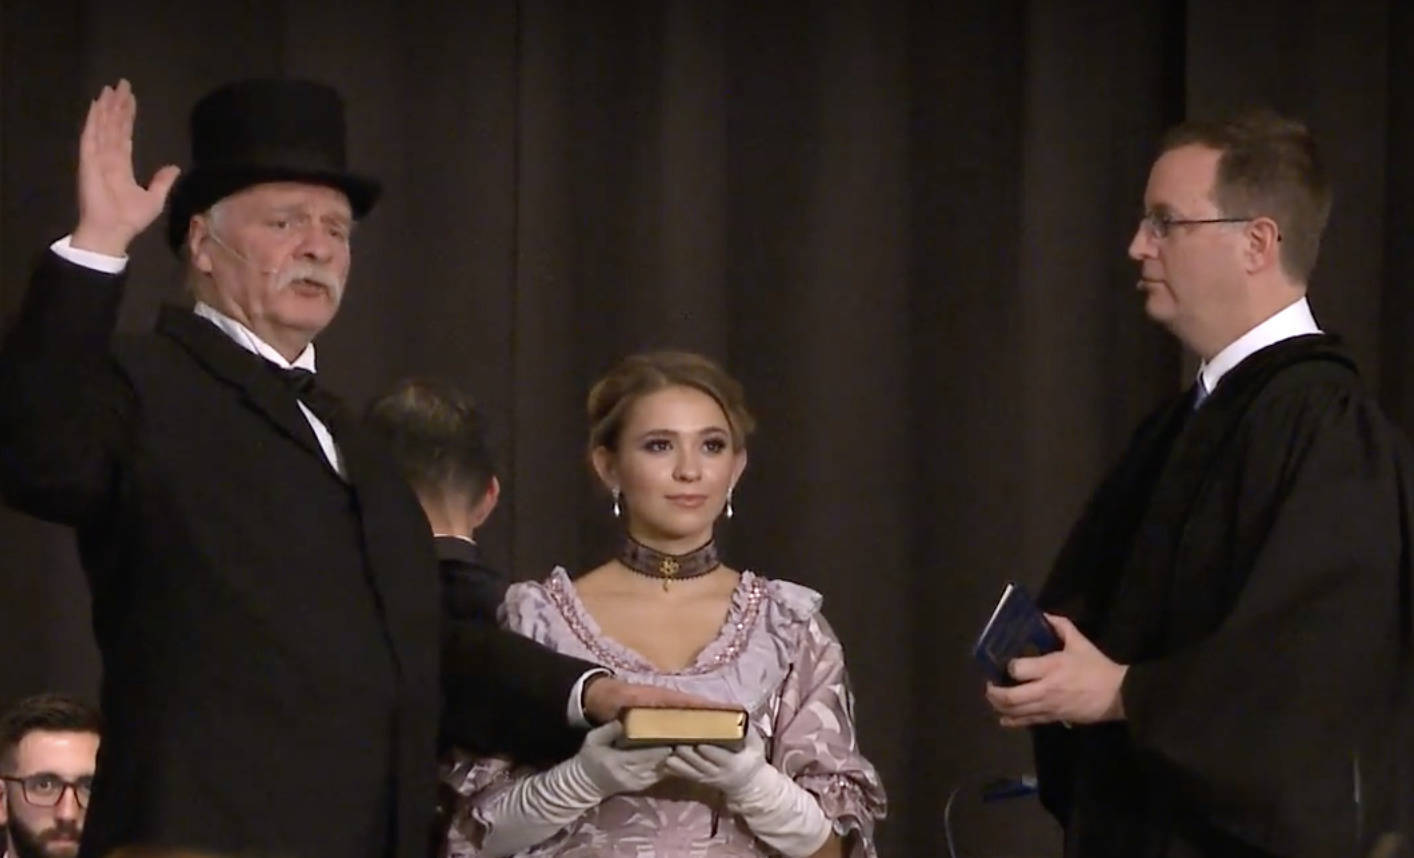 Grover Cleveland Inaugural Reenactment Gala